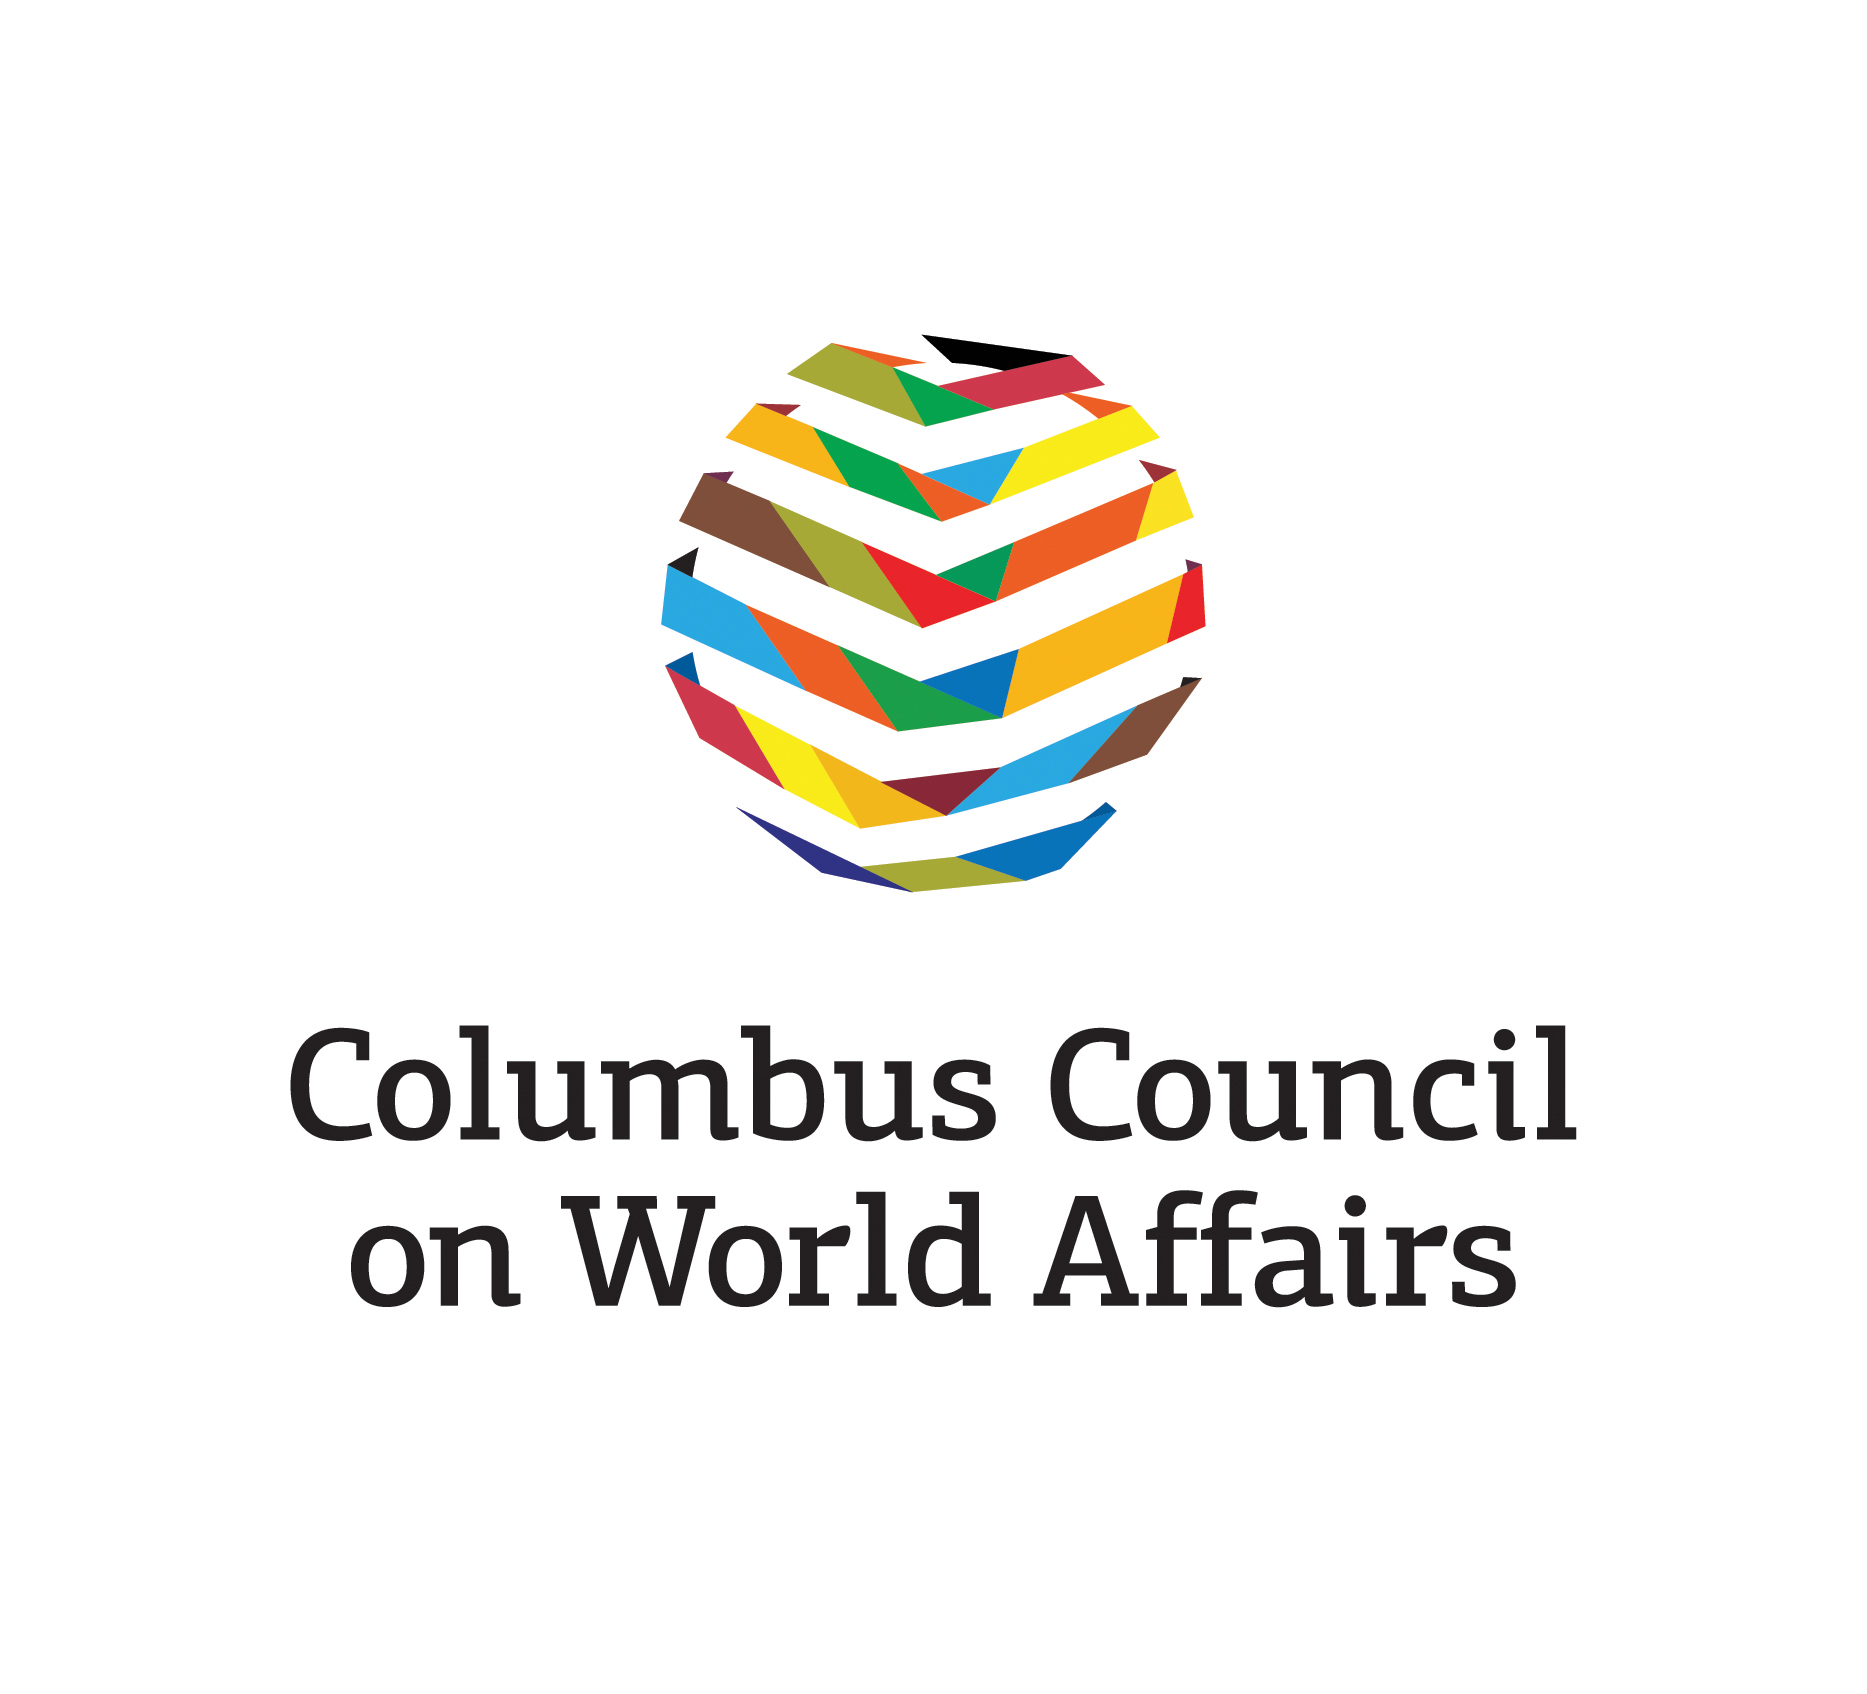 Columbus Council on World Affairs